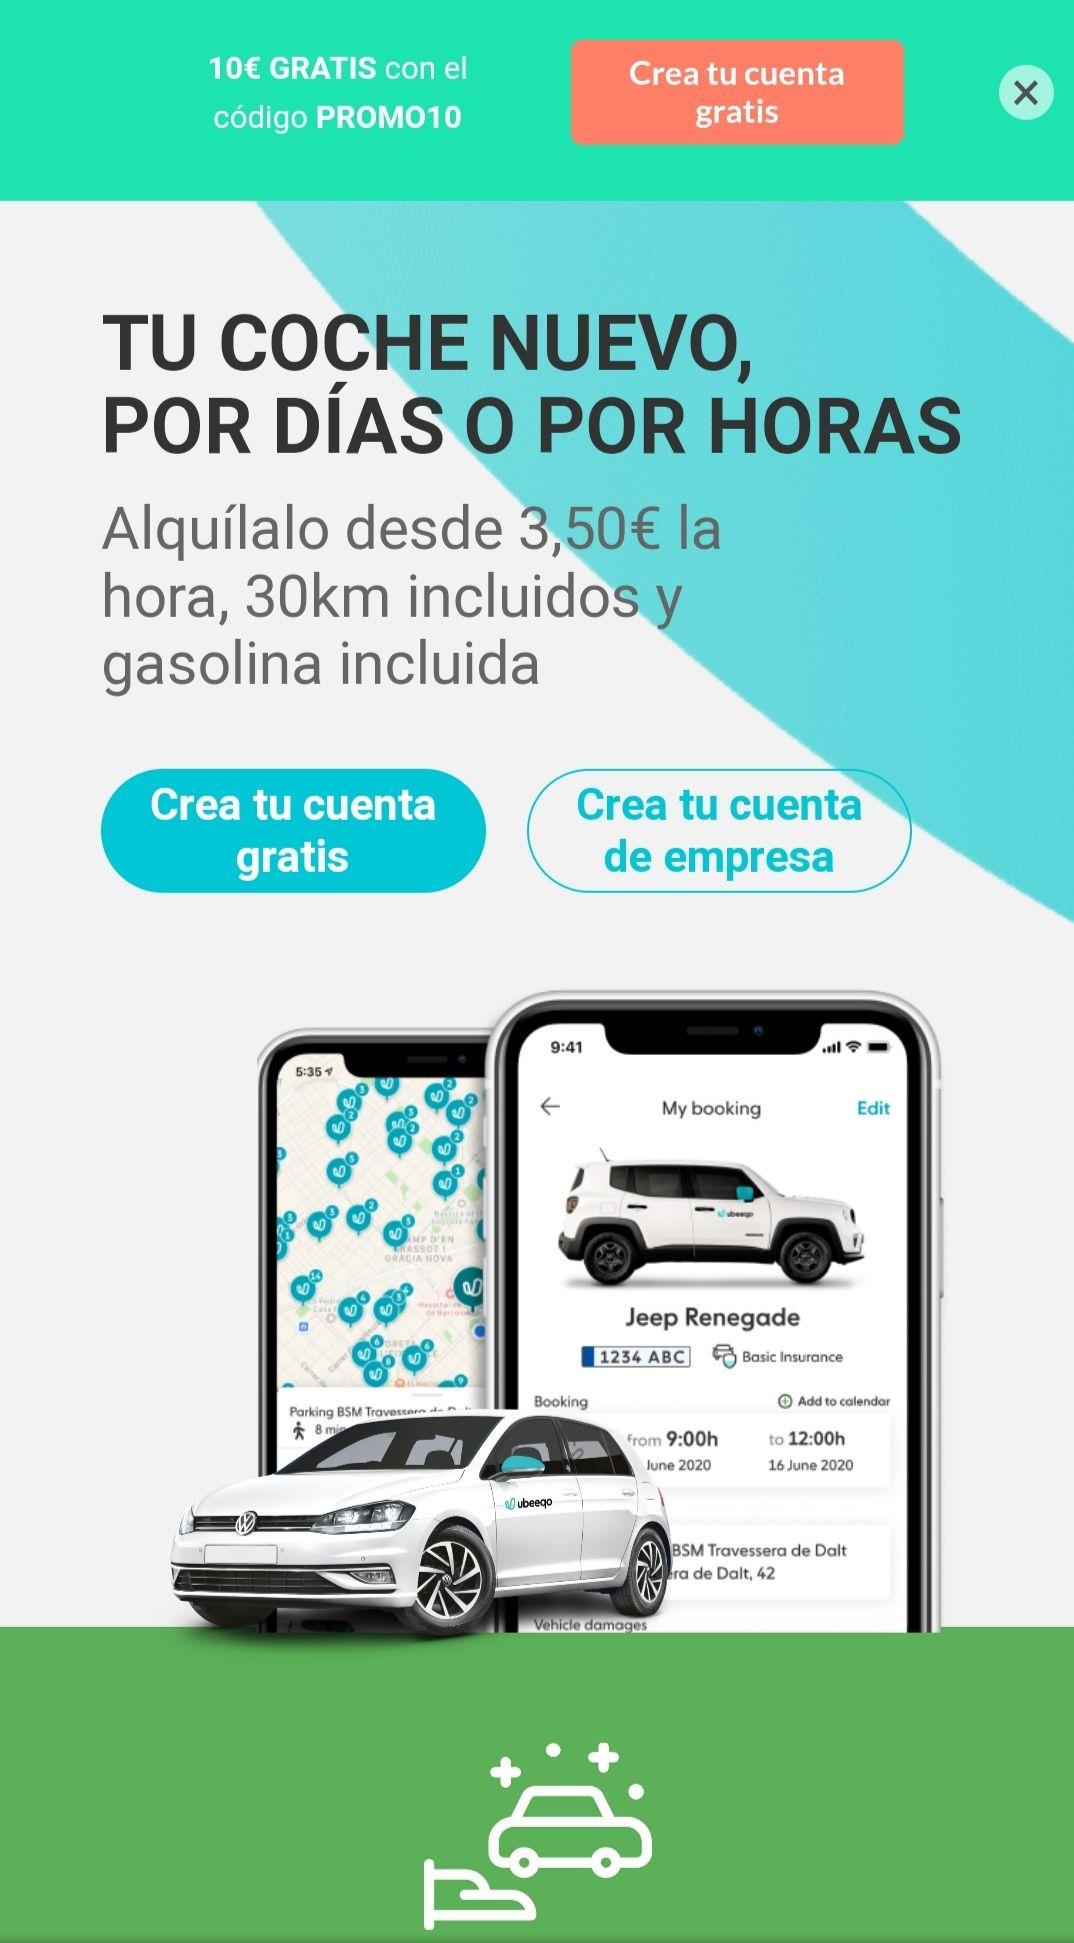 10 euros gratis en alquiler de Vehículo (Nuevos clientes)